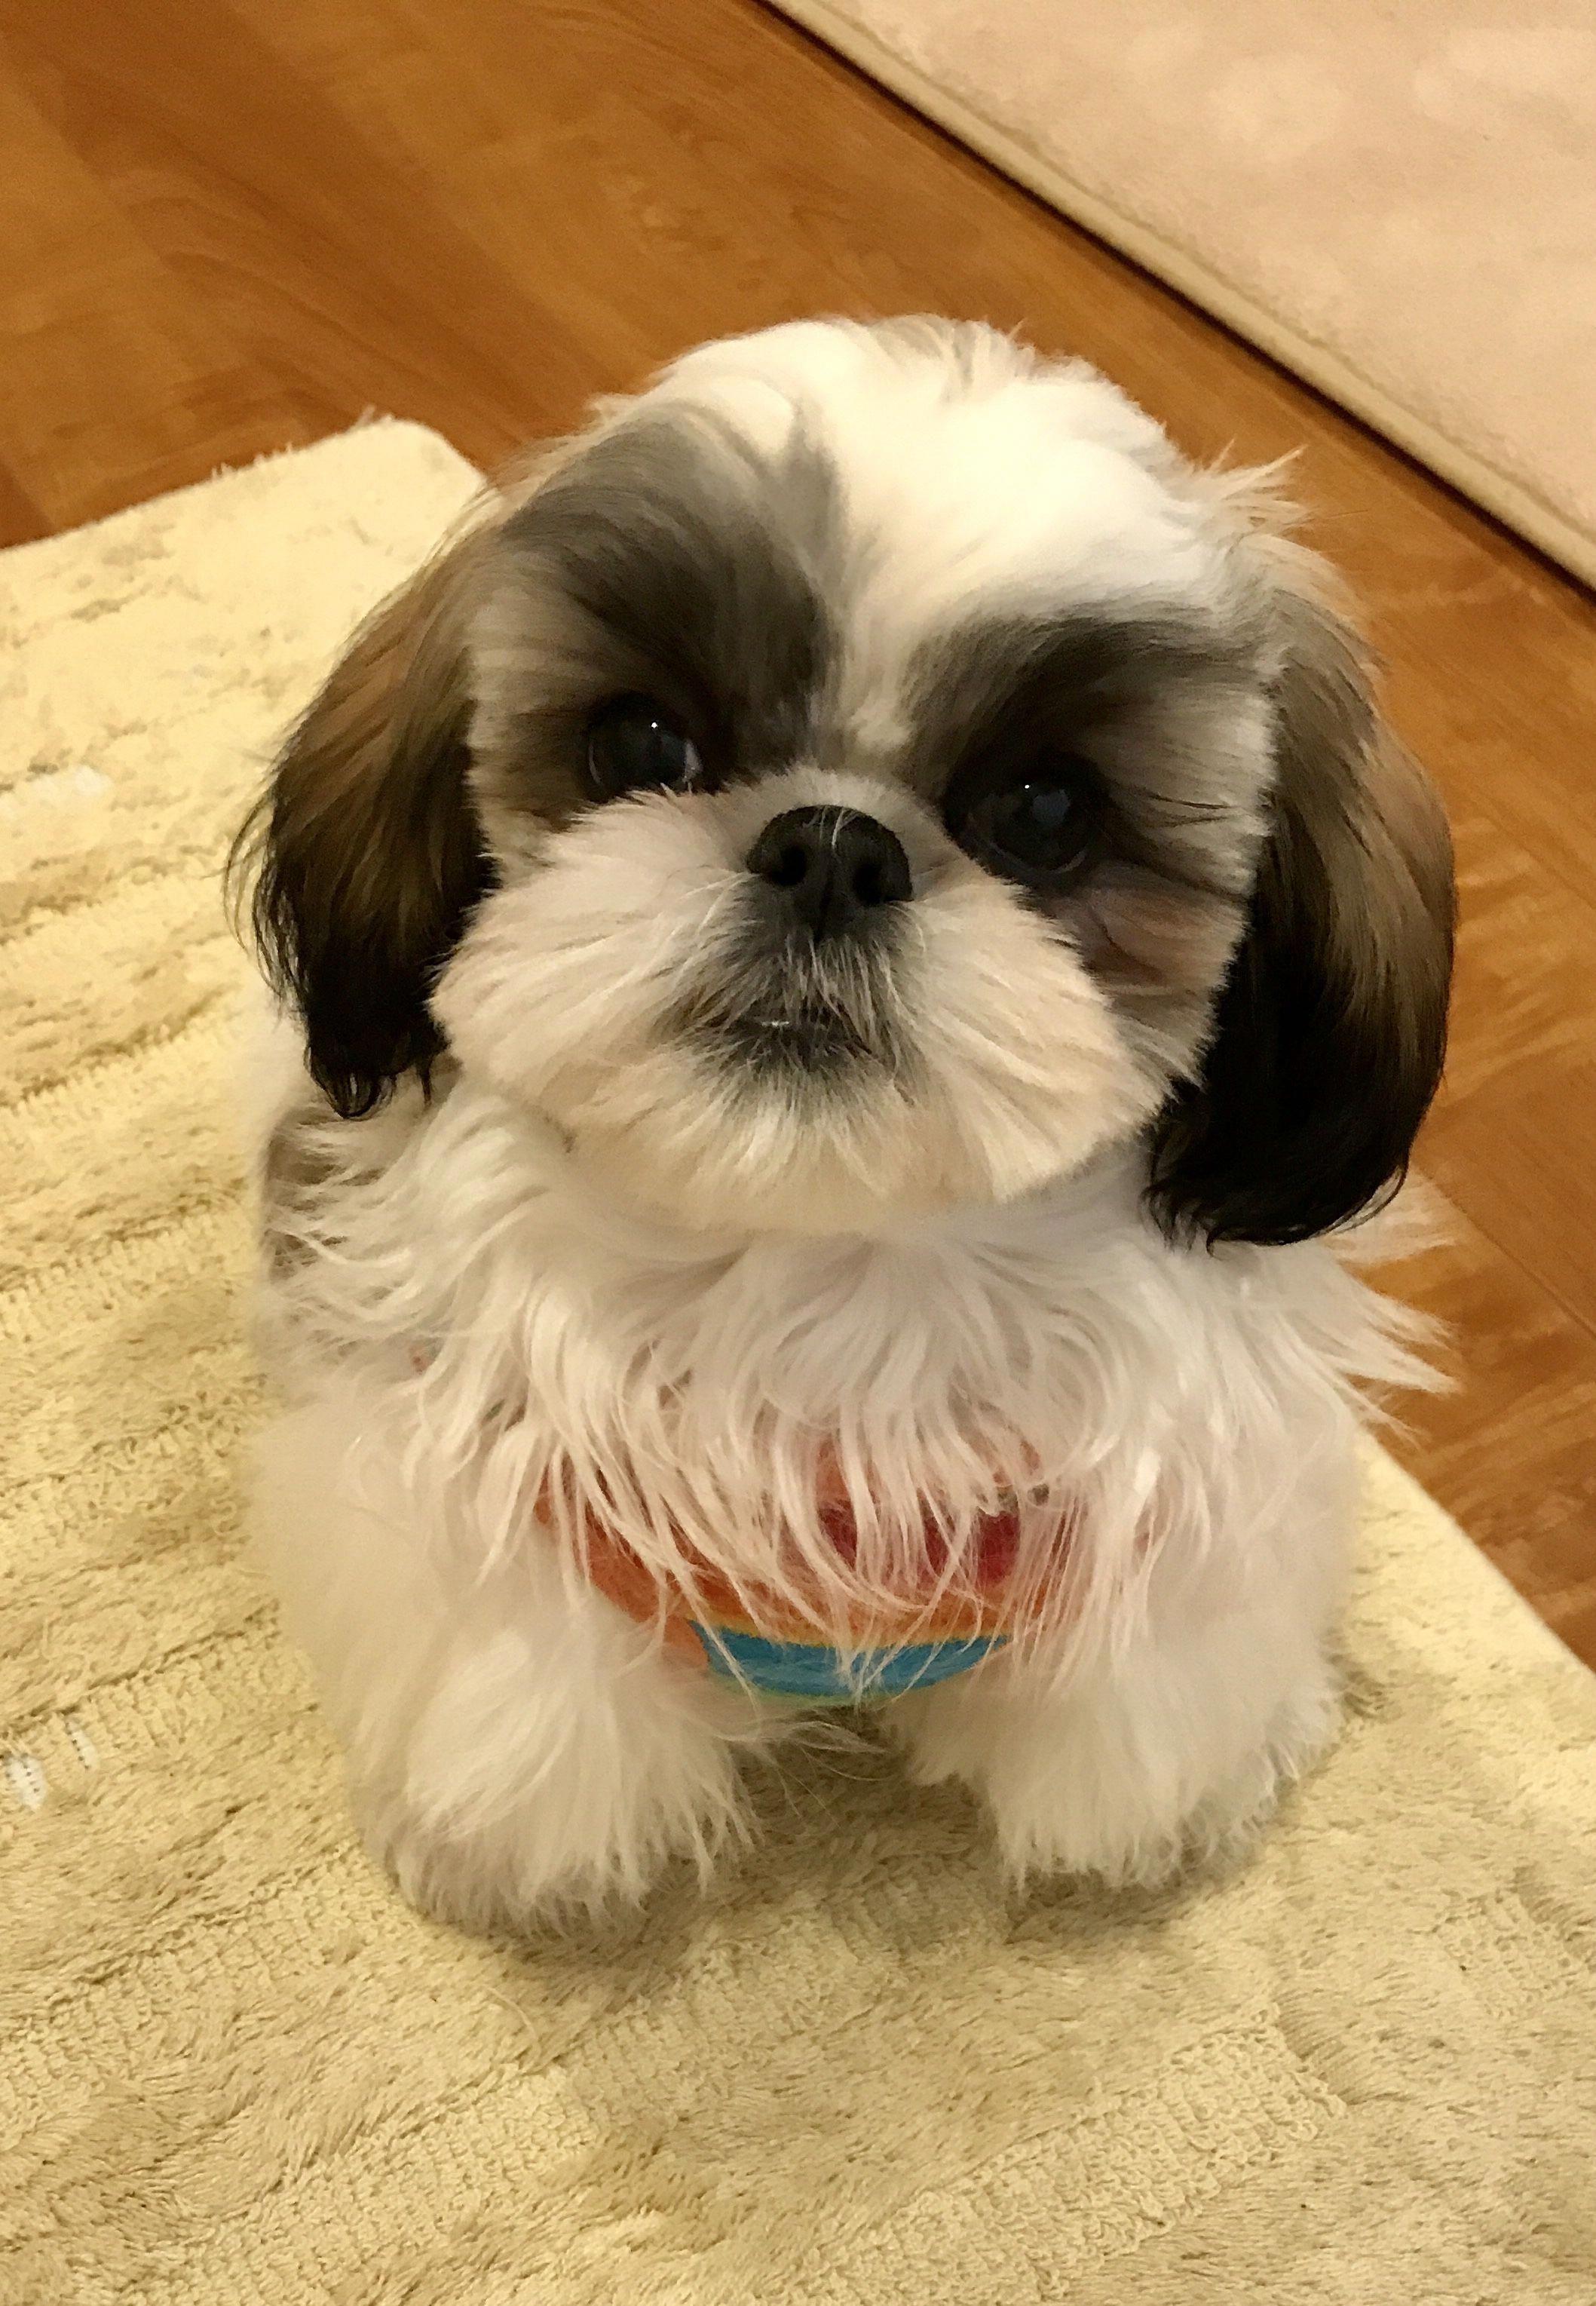 Discover Smart Shih Tzus Exercise Needs Shihtzumania Shitzugoiania Shih Tzu Puppy Shih Tzu Shitzu Puppies